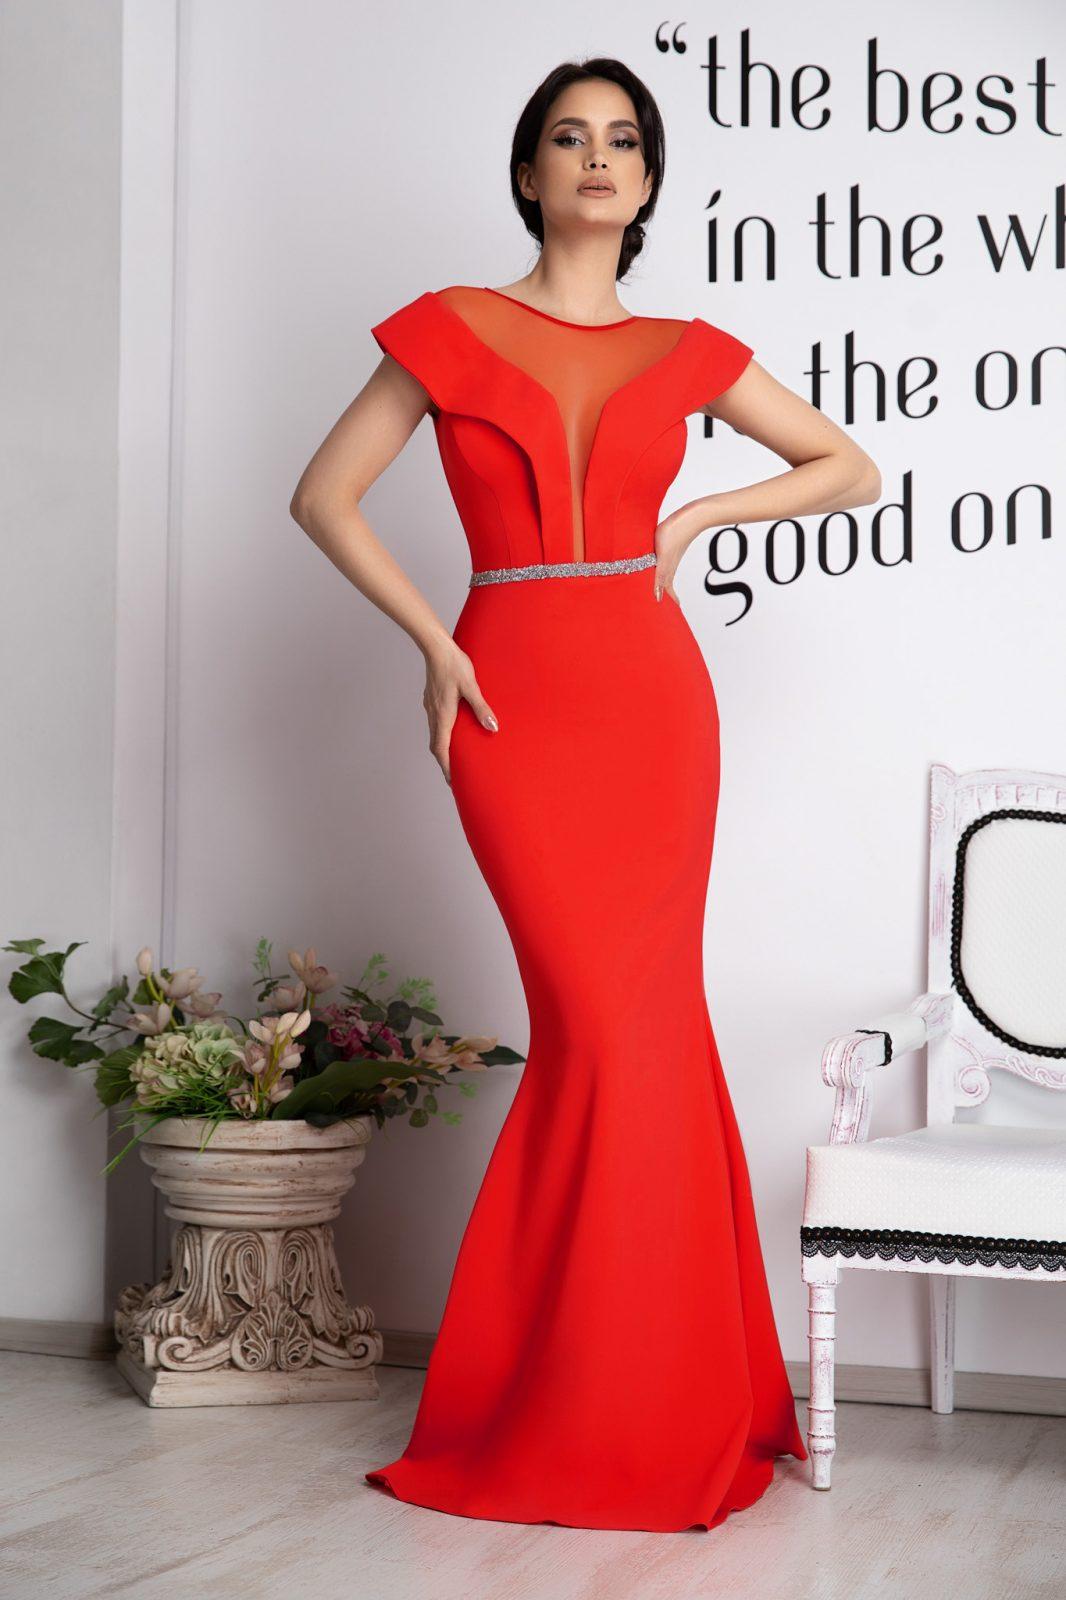 Vibrating Red Dress